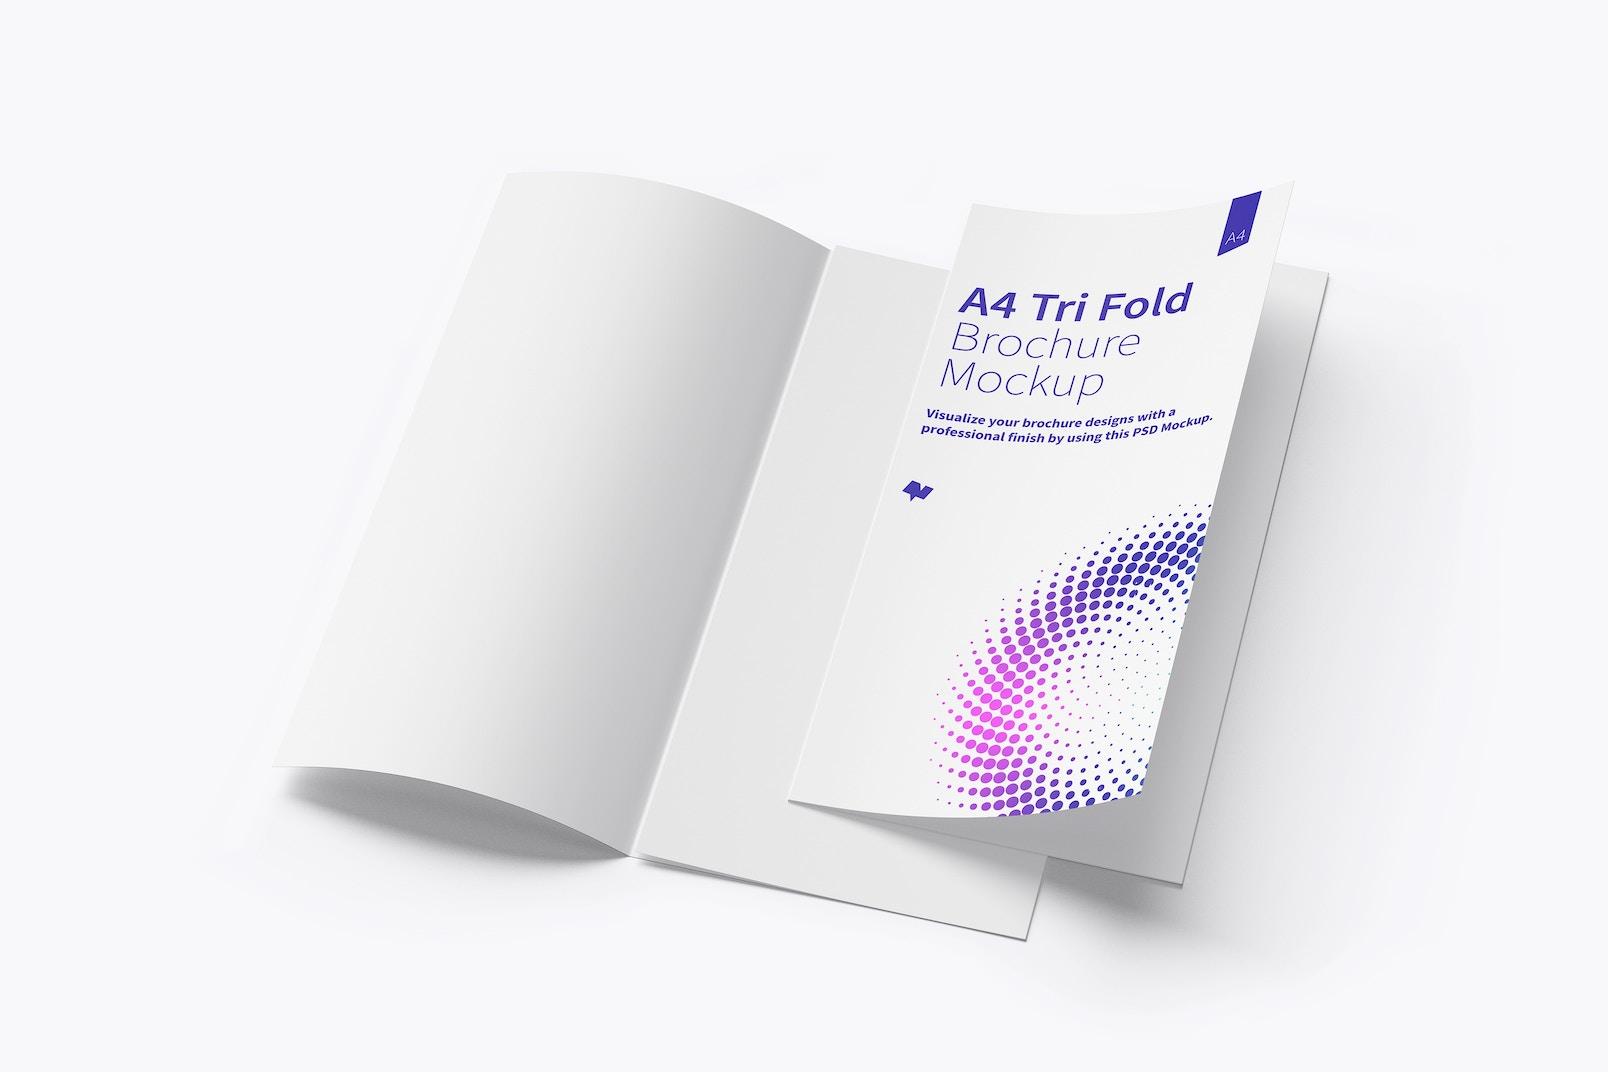 A4 Trifold Brochure Mockup 06